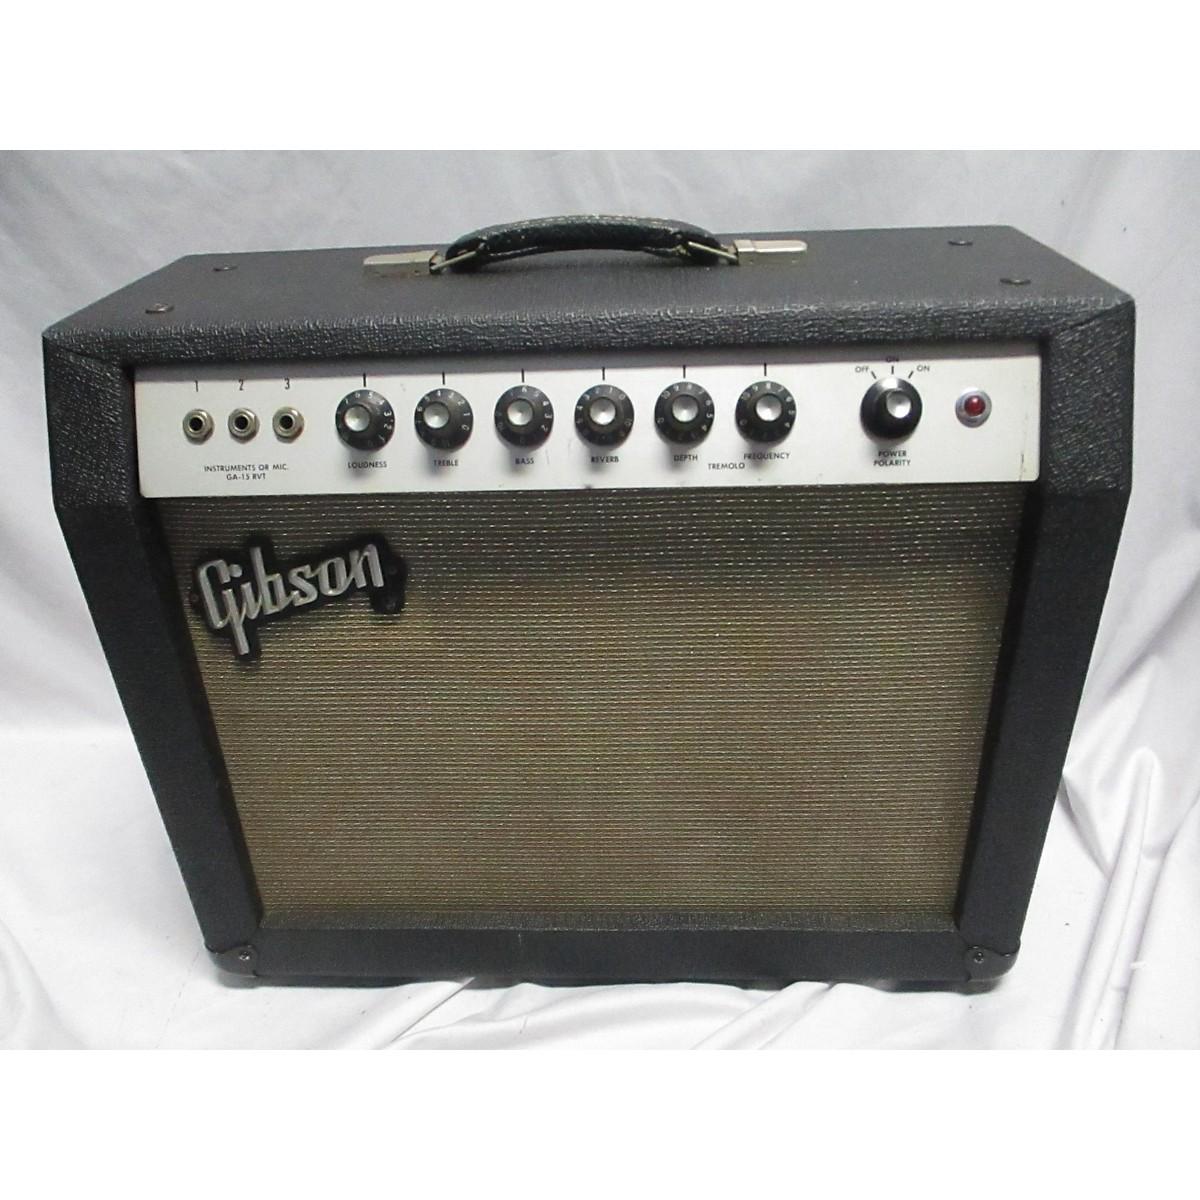 Gibson 1965 GA15RVT Tube Guitar Combo Amp